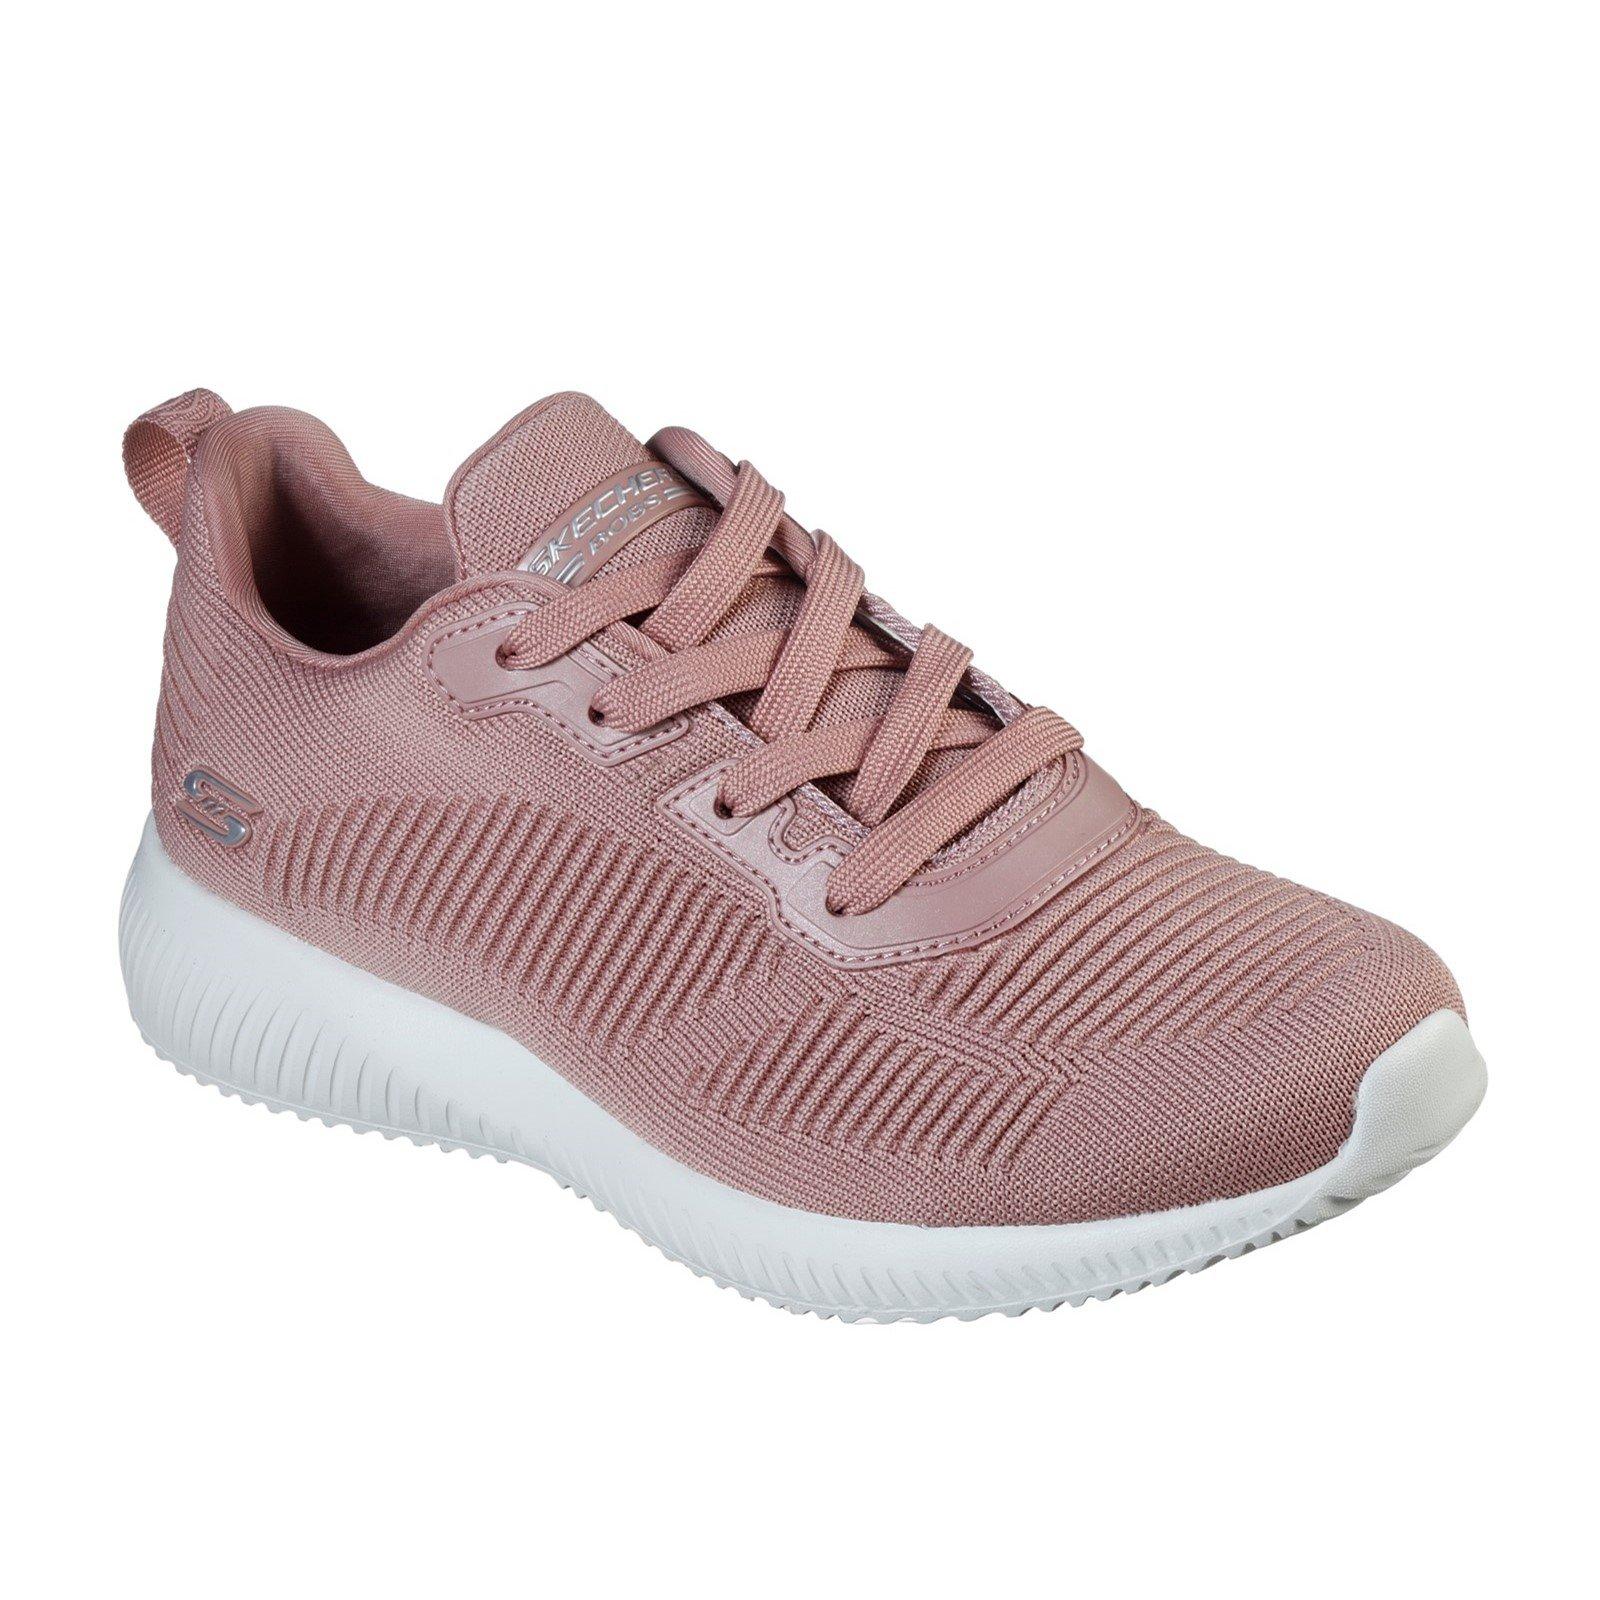 Skechers Women's Bobs Squad Tough Talk Wide Trainer Various Colours 33062 - Pink 8